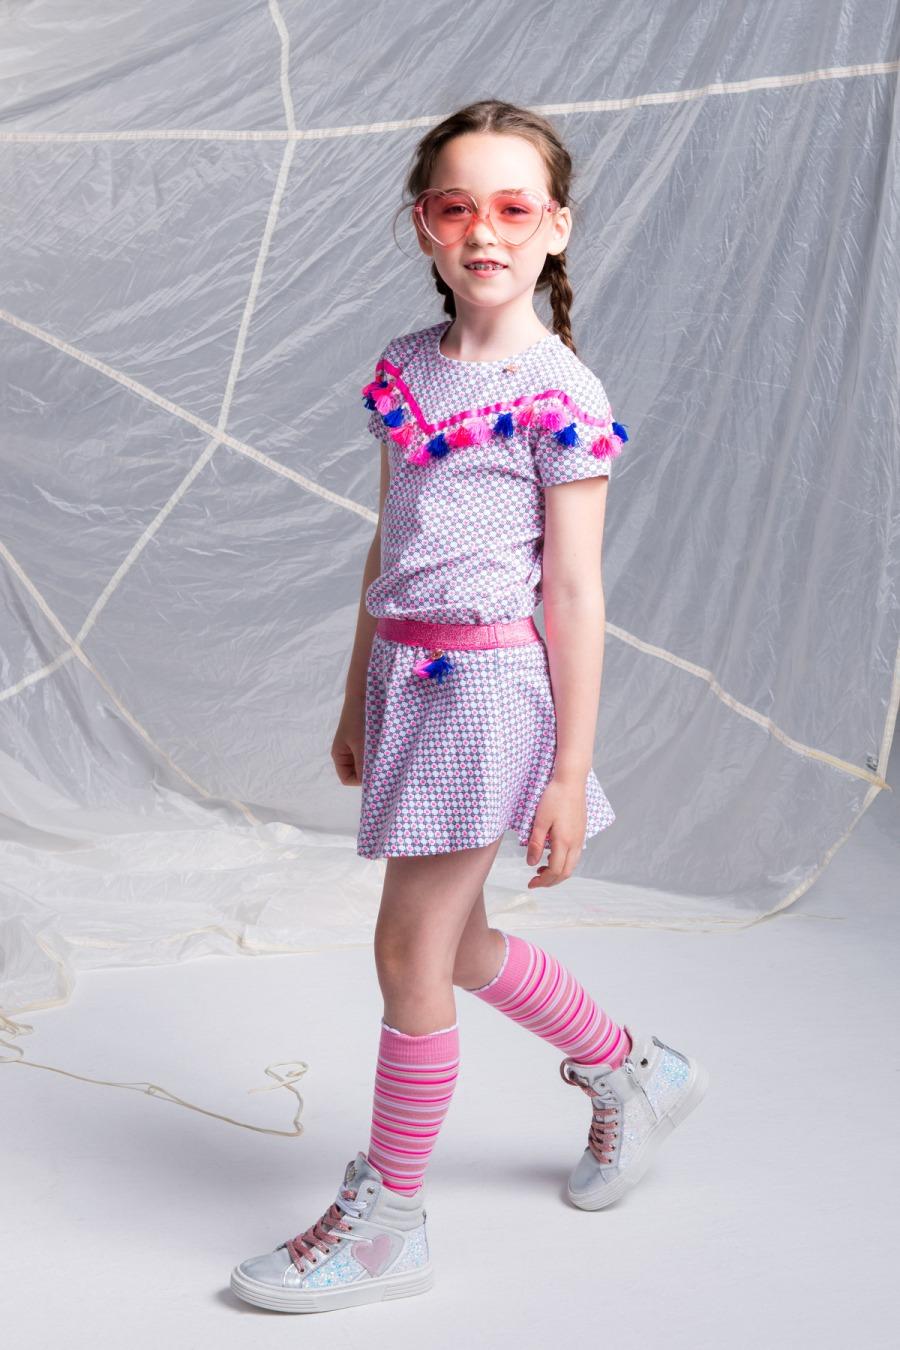 roze-jurk-mimpi-puurvangeluk